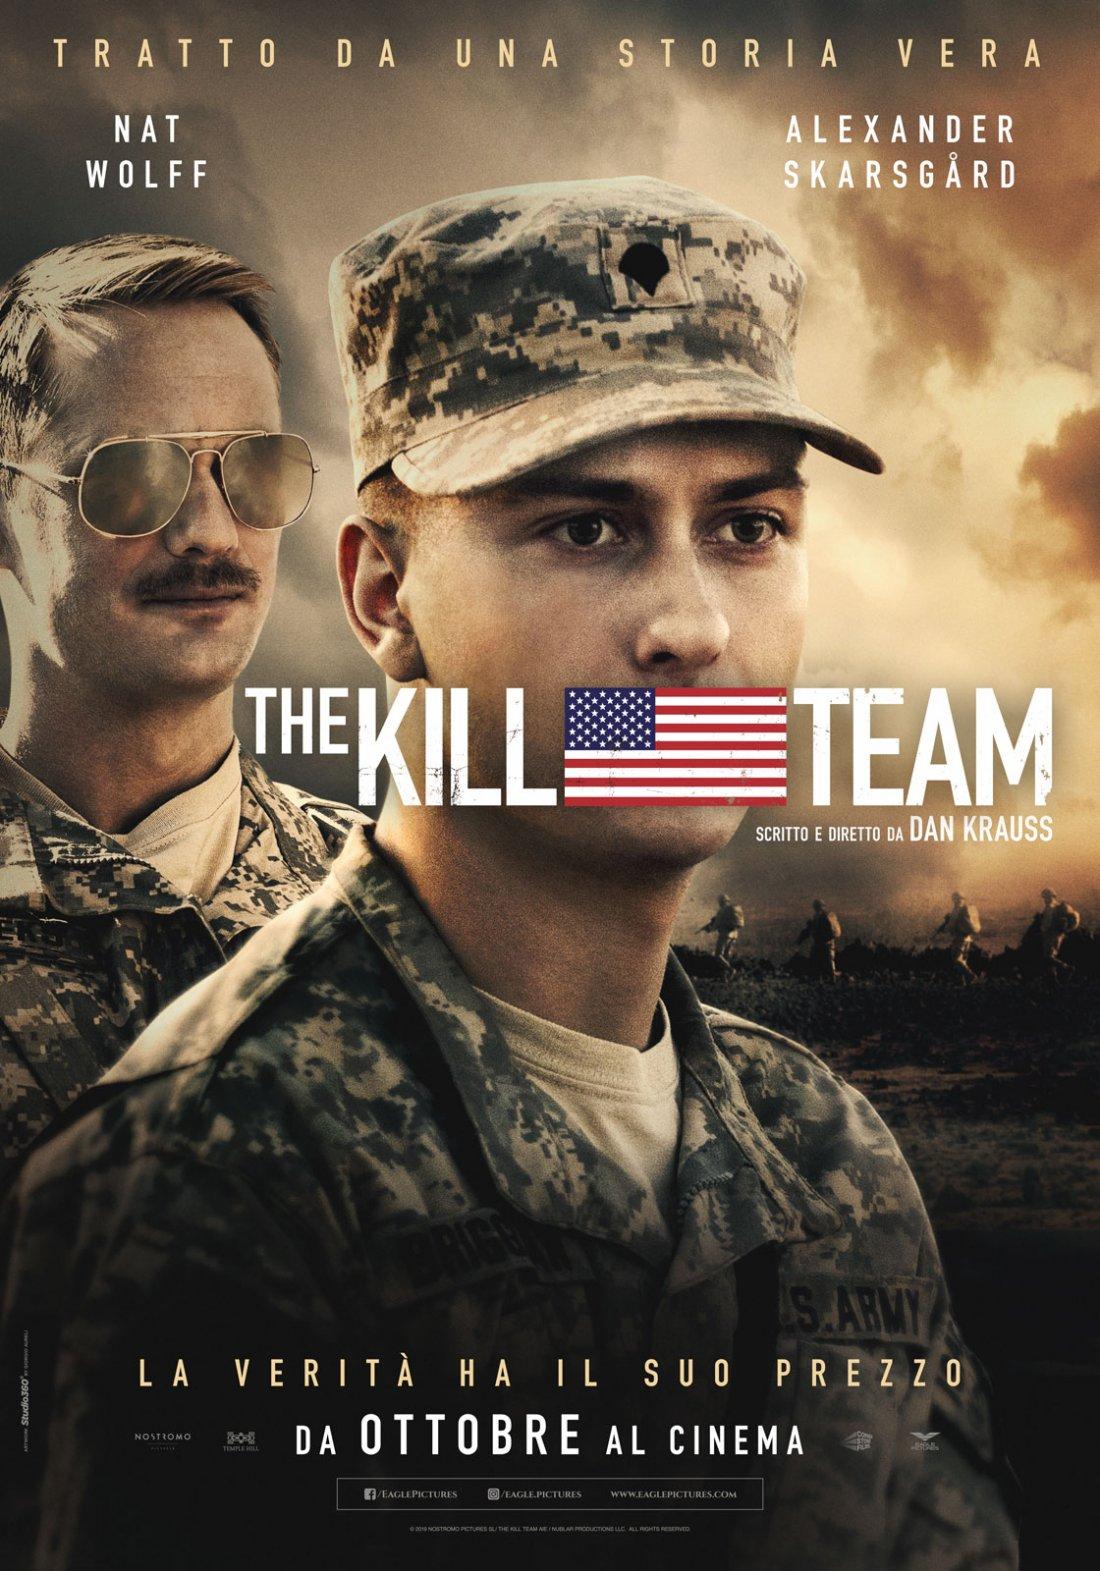 The Killer Team